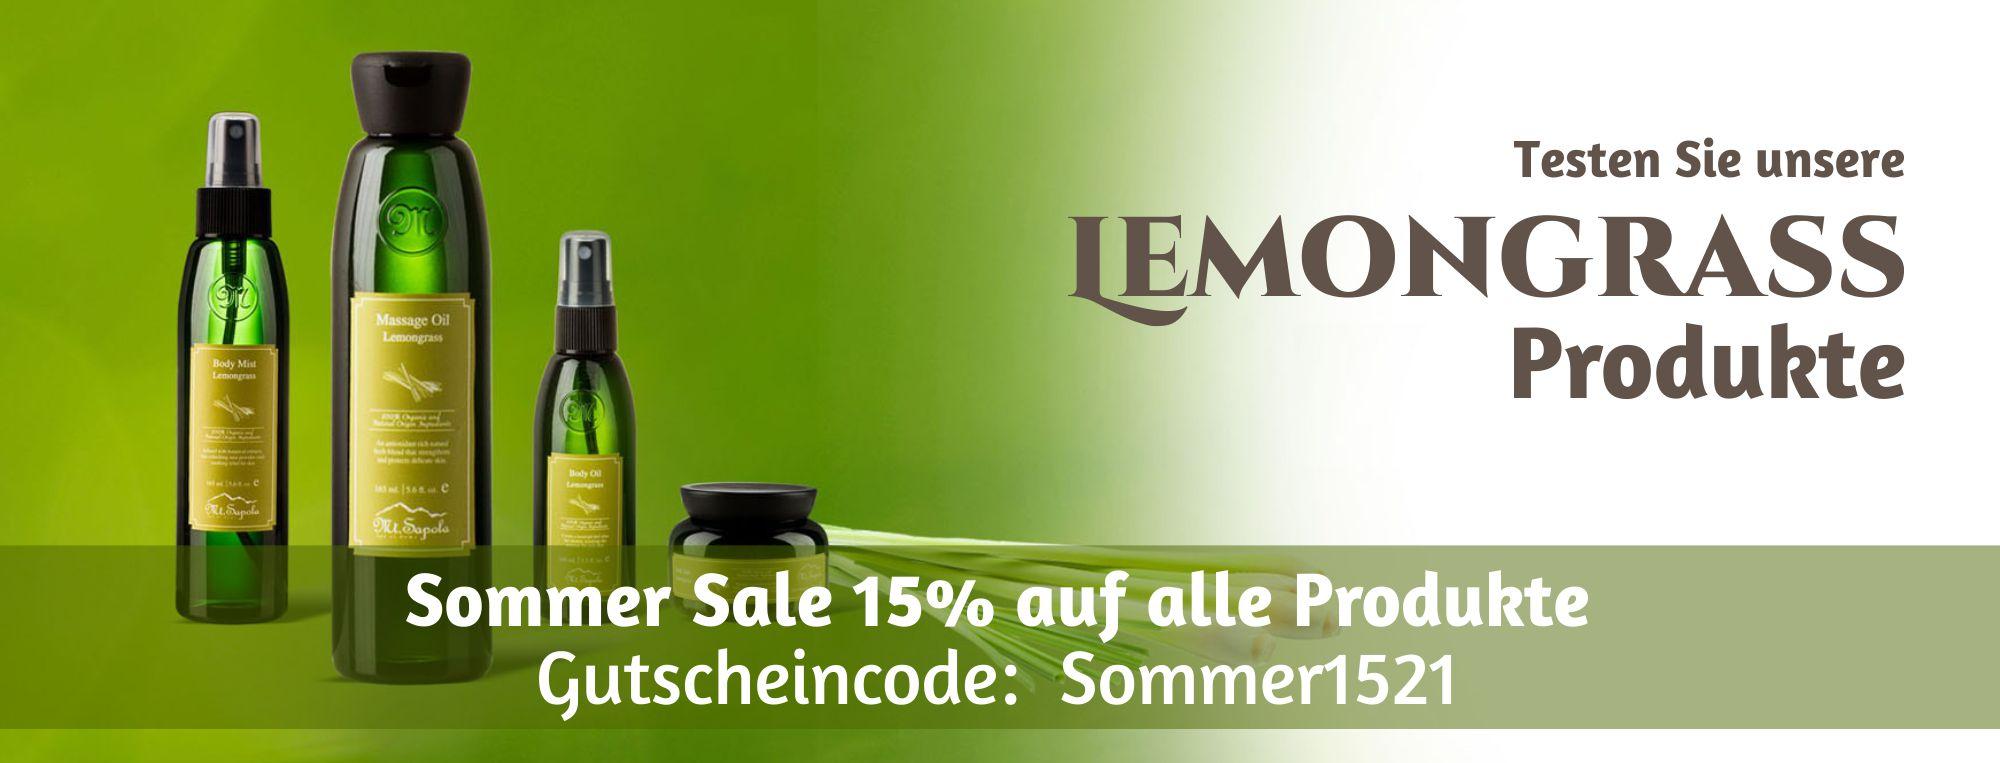 mtsapola-shop.de/body-spa/lemongrass